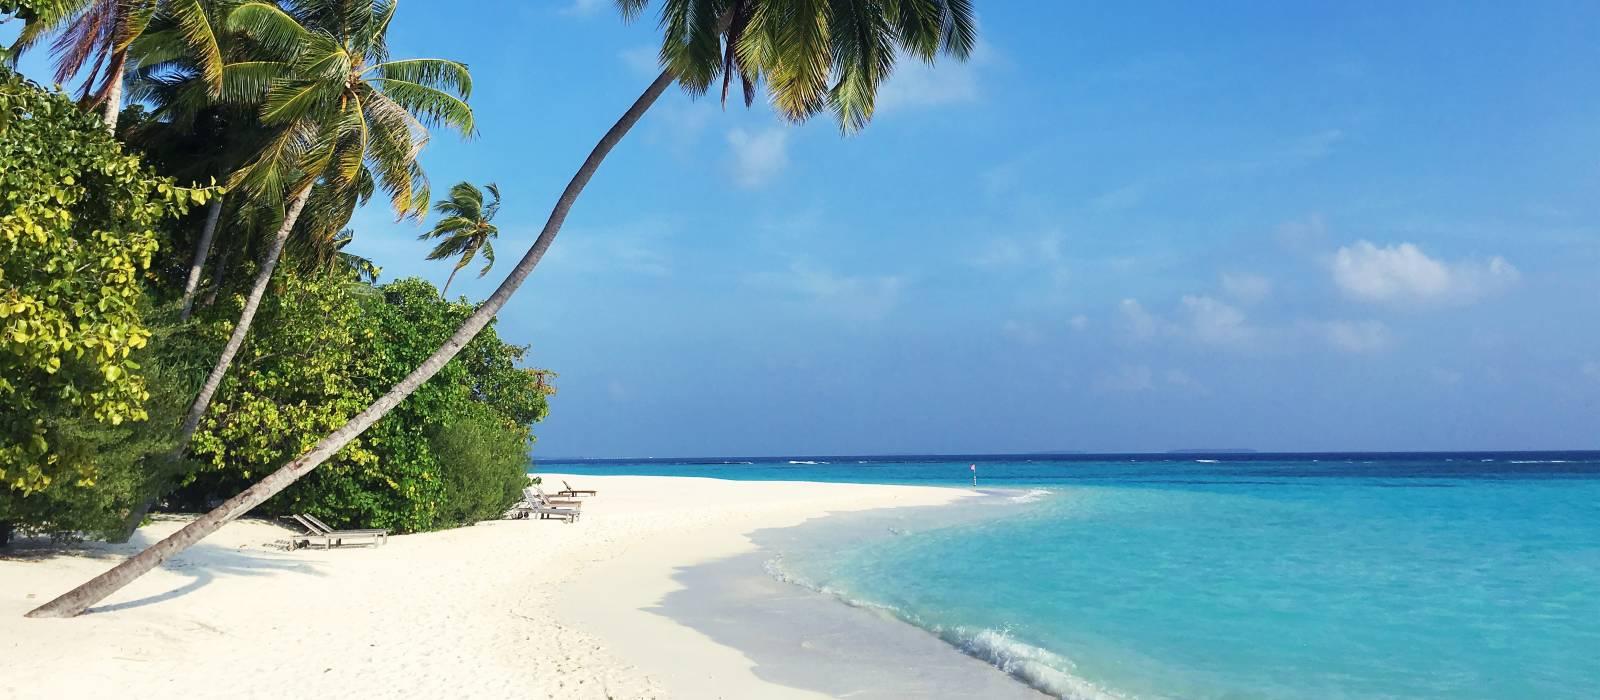 Maldives: Barefoot Luxury Tour Trip 1